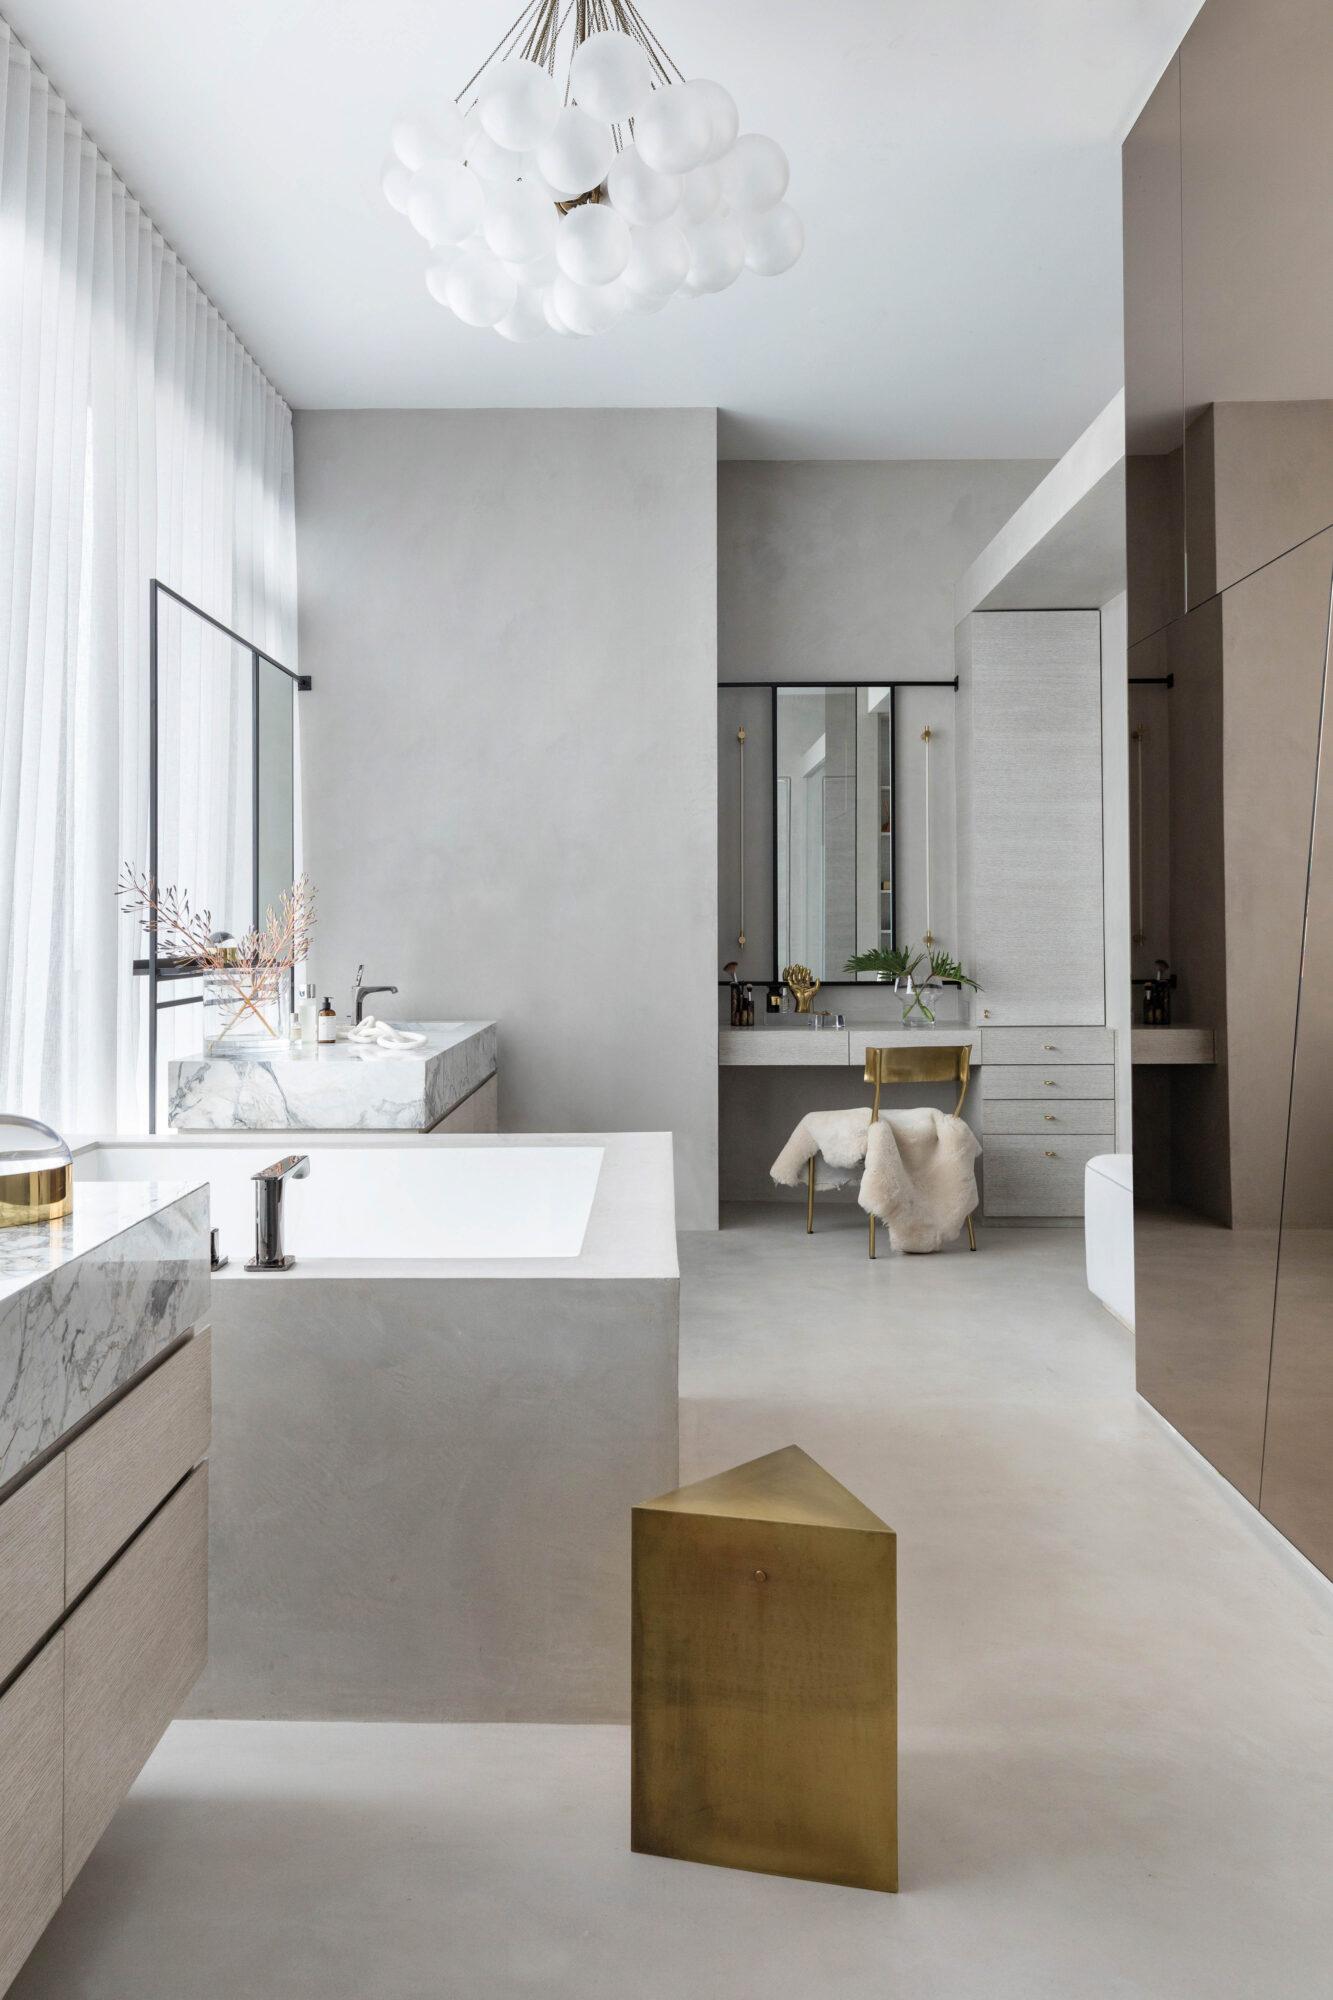 bathroom tub window gold stool